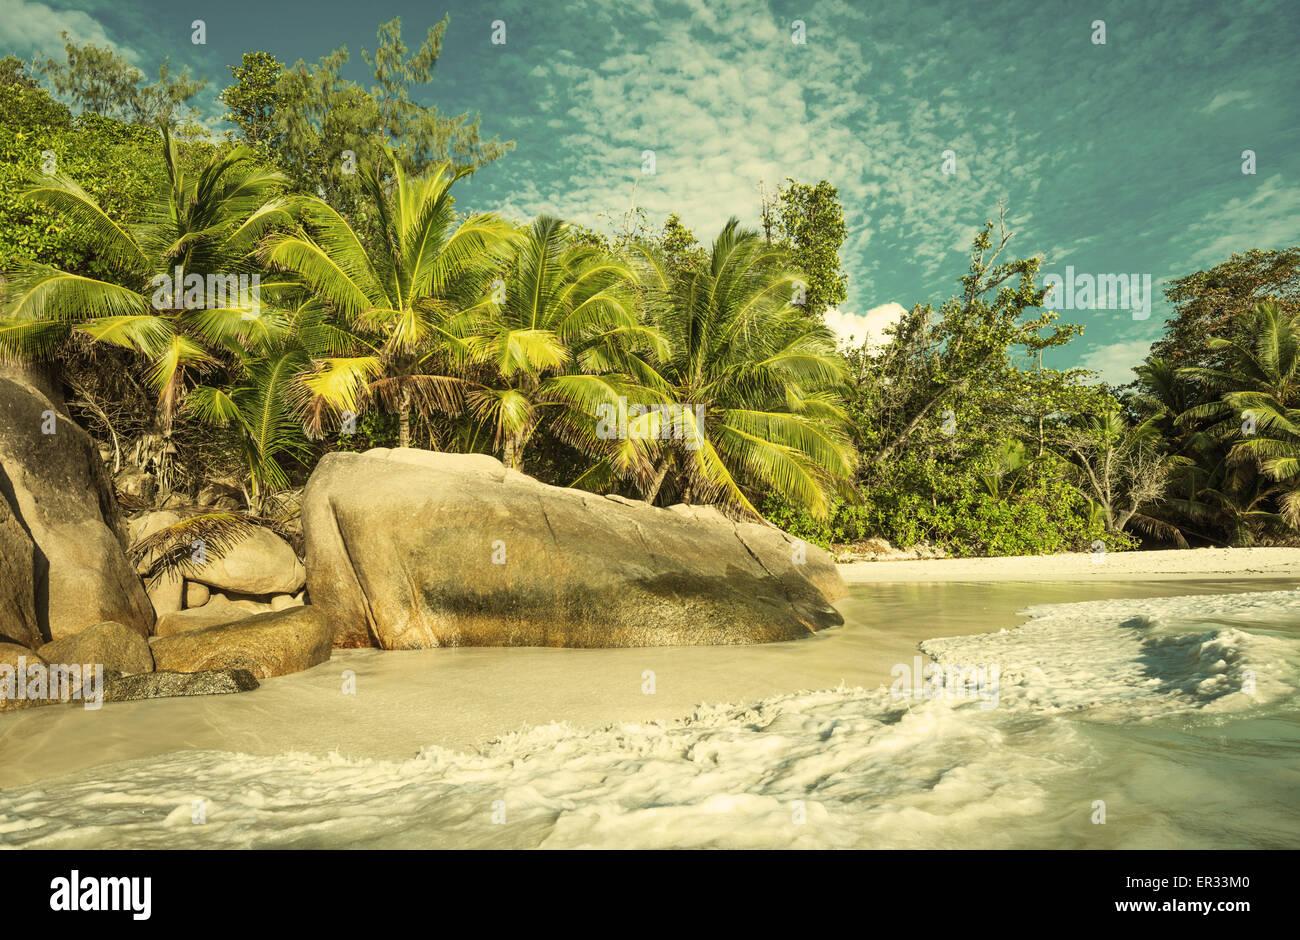 Retro style image of tropical island beach Anse Lazio, Praslin, Seychelles - Stock Image